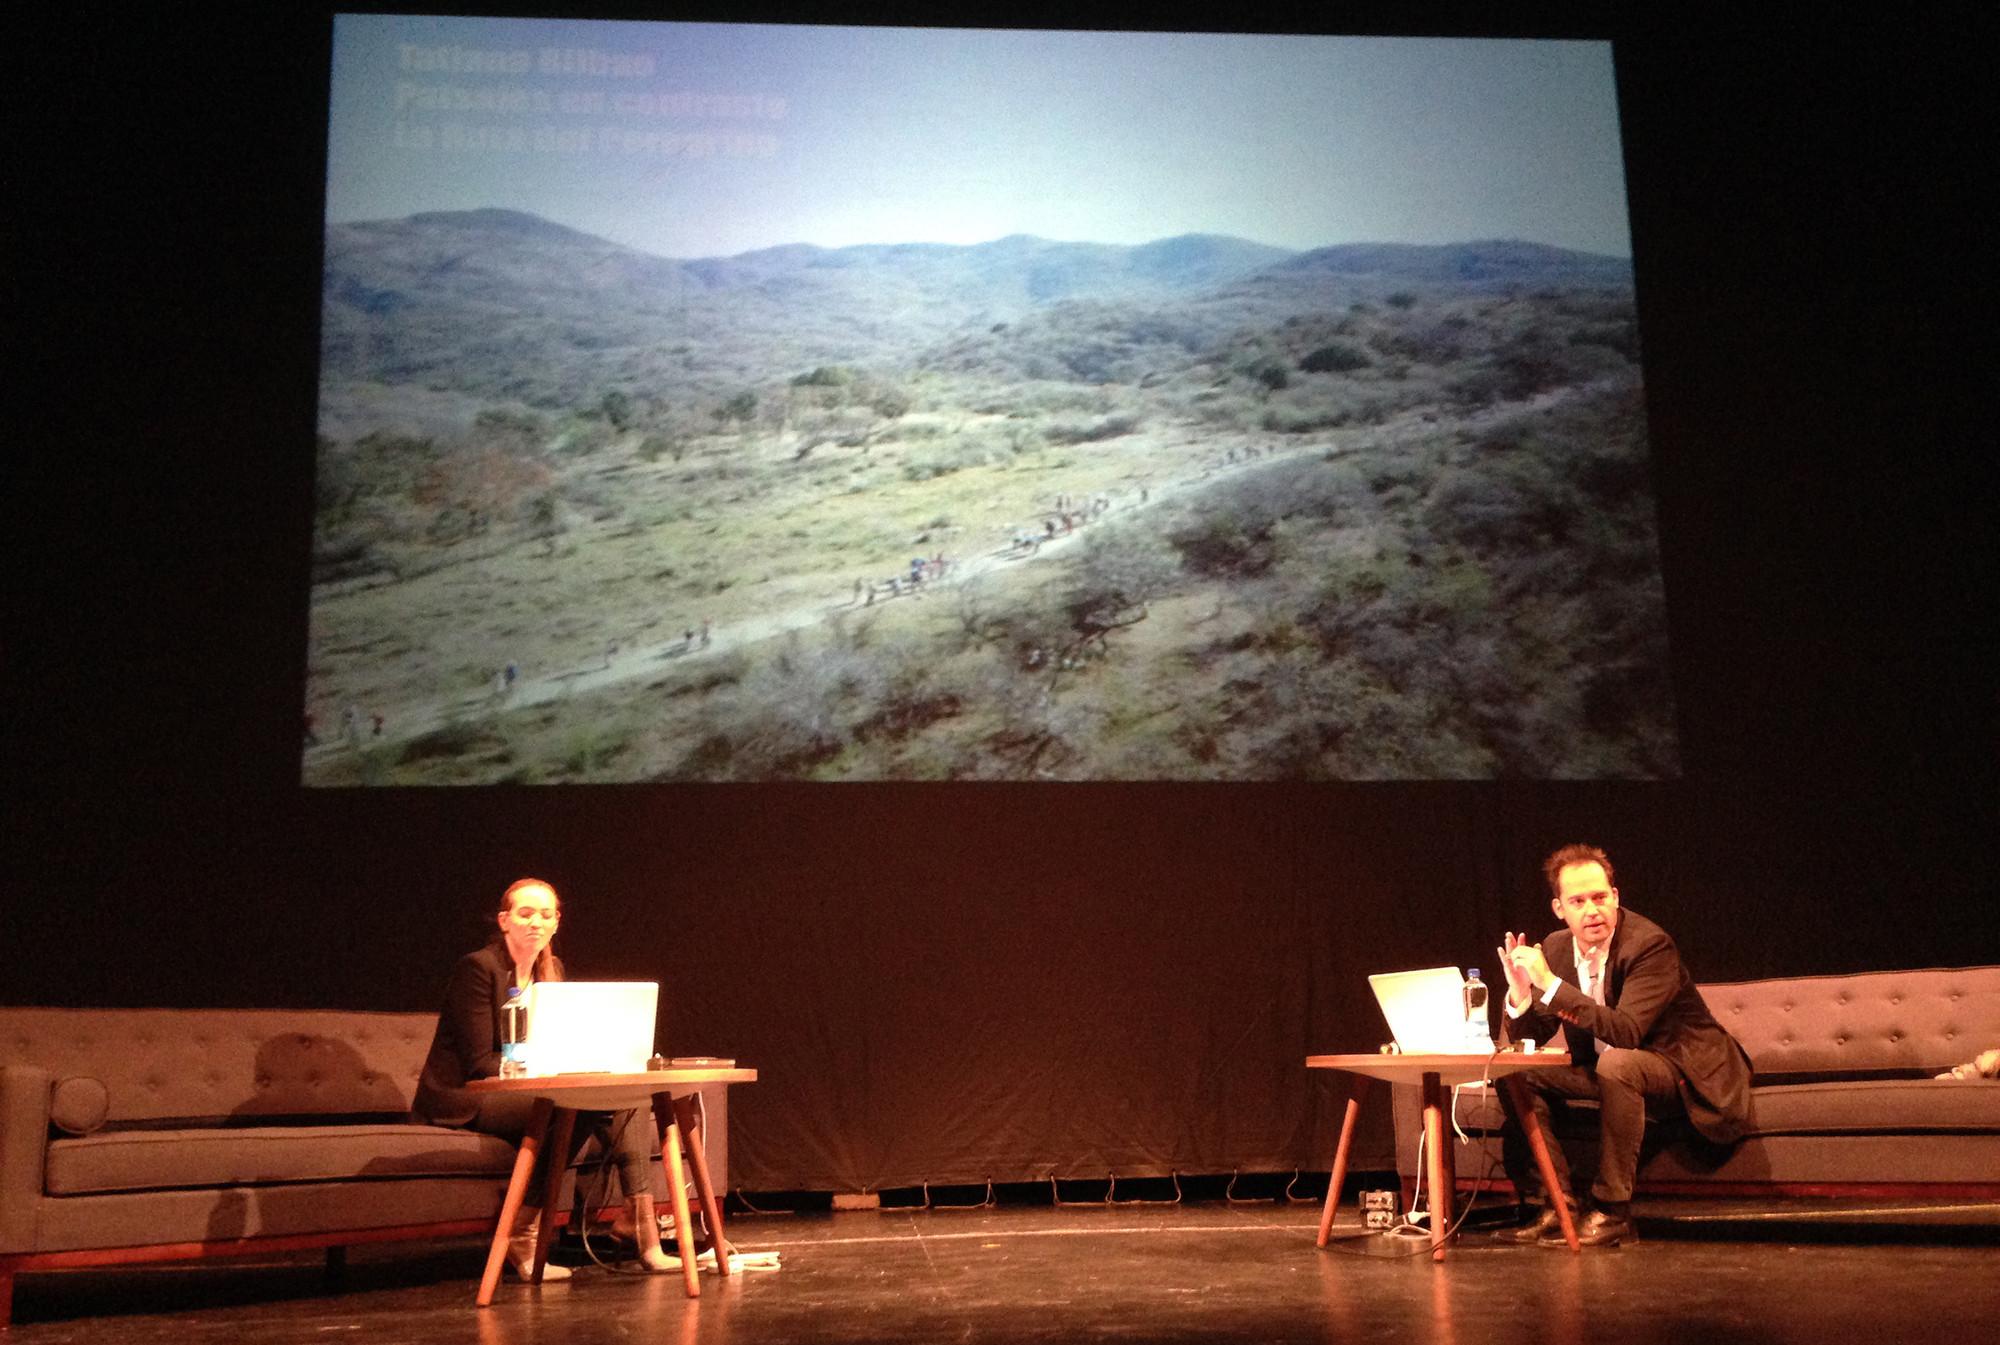 Tatiana Bilbao y Felipe Assadi. Image Courtesy of Arquine